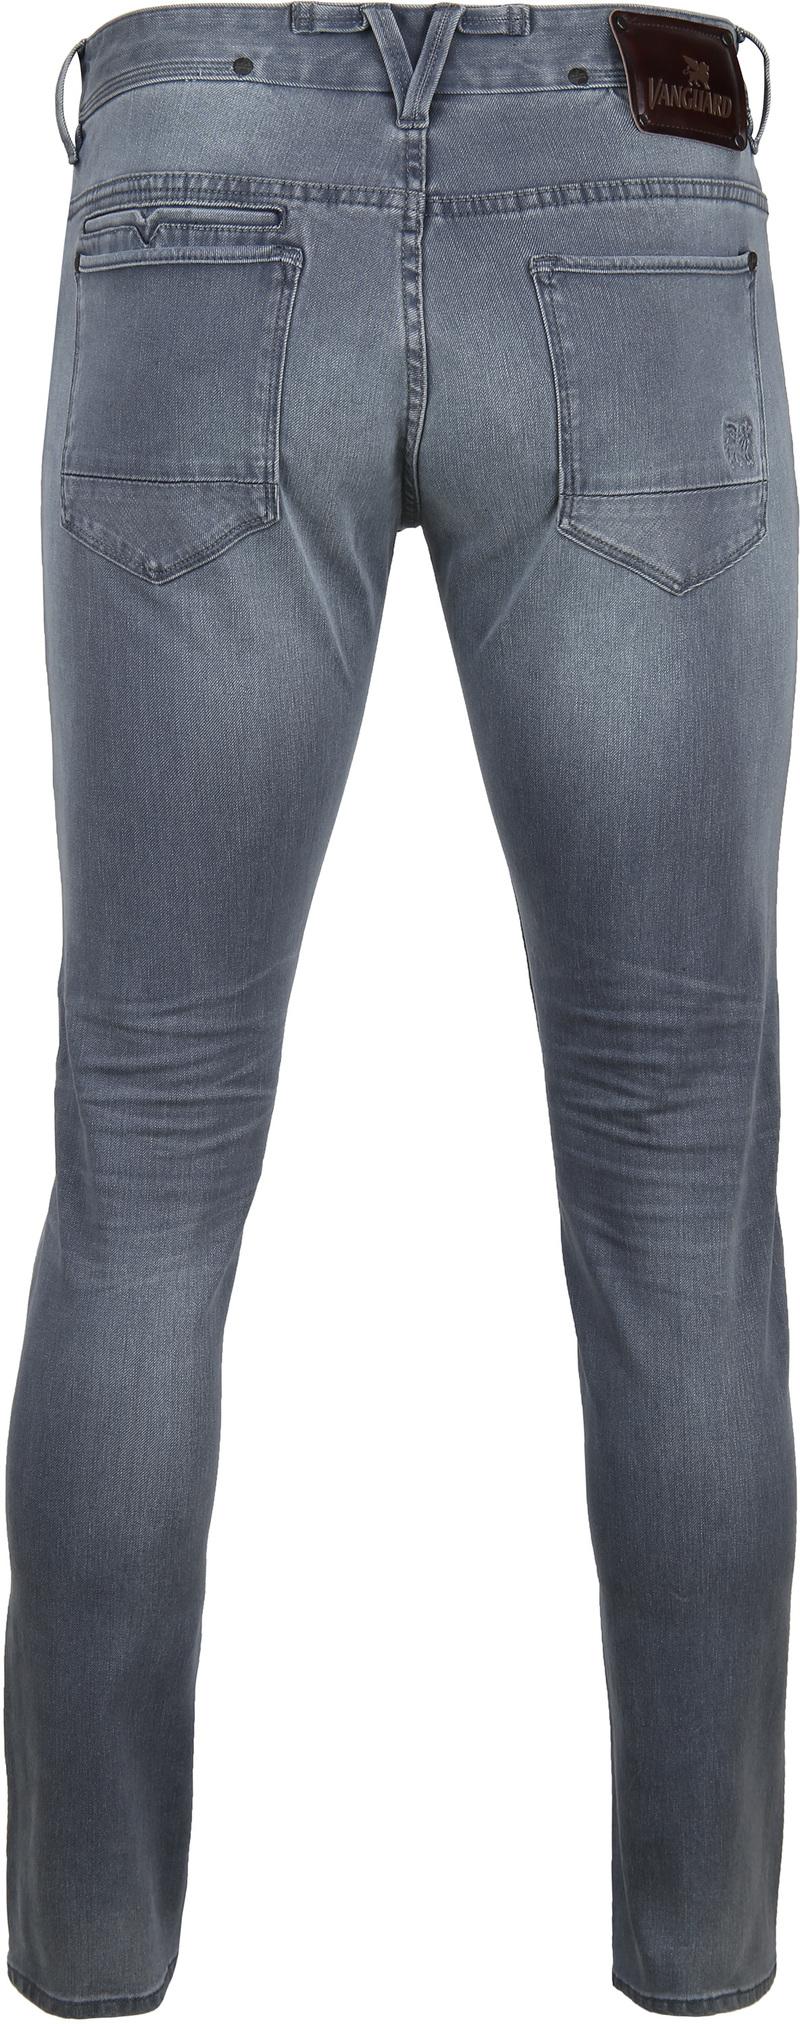 Vanguard V850 Rider Grey Jeans foto 3